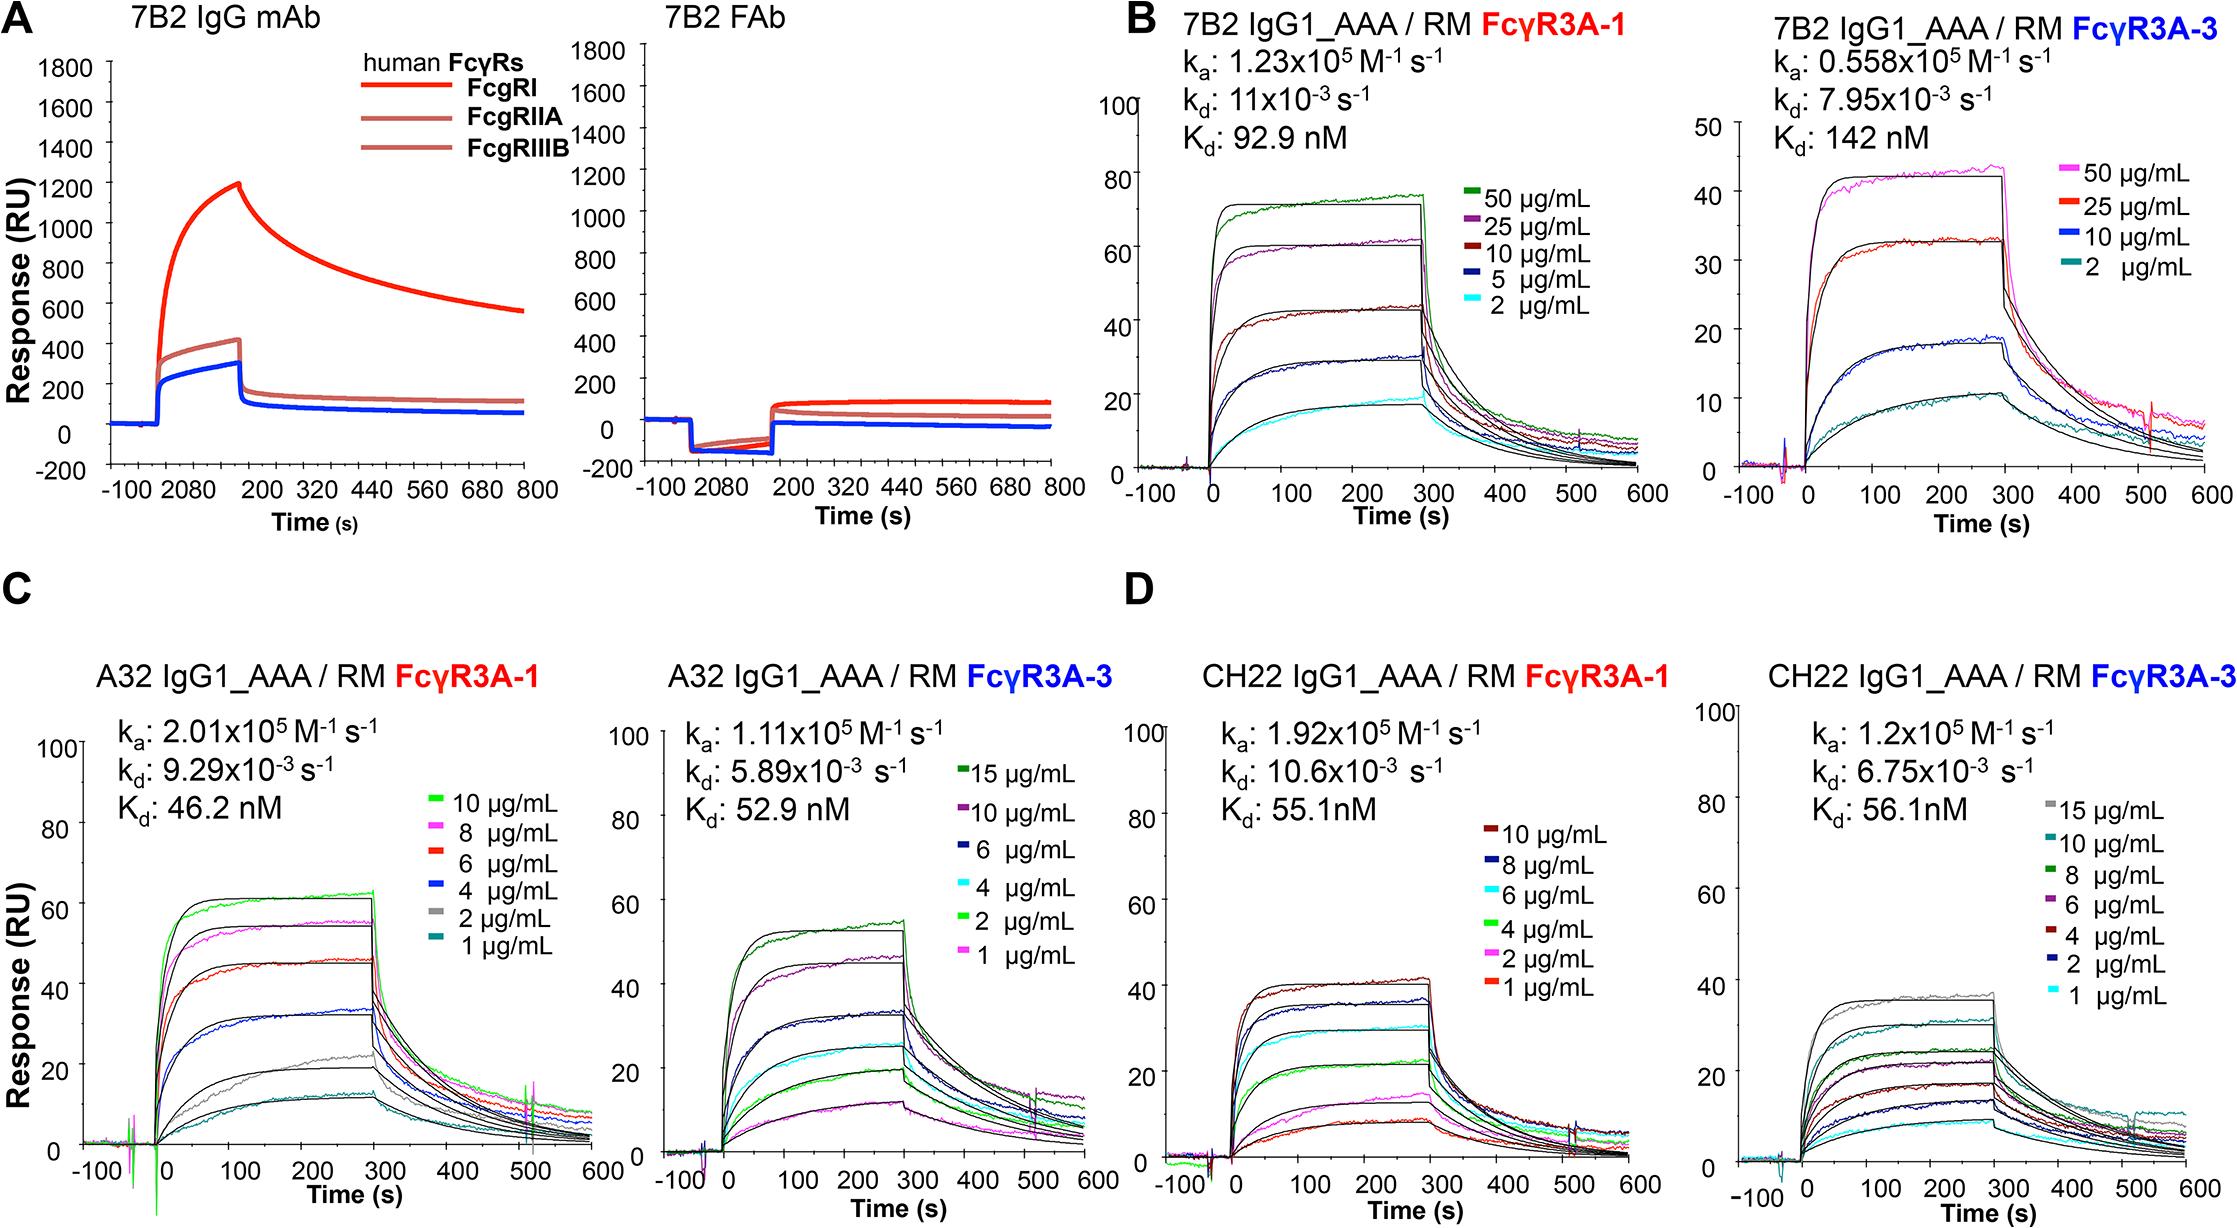 Surface plasmon resonance of mAbs to human and rhesus FcR.